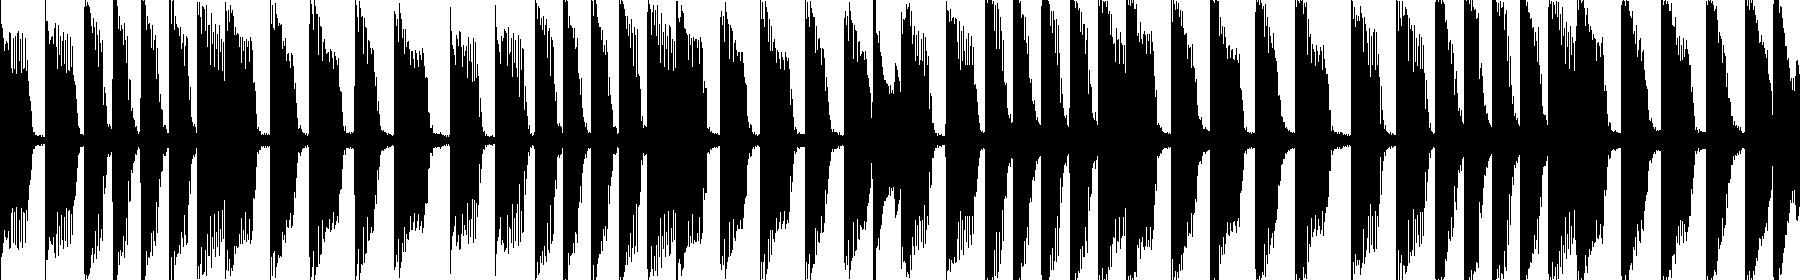 vedh melodyloop 075 g 124bpm